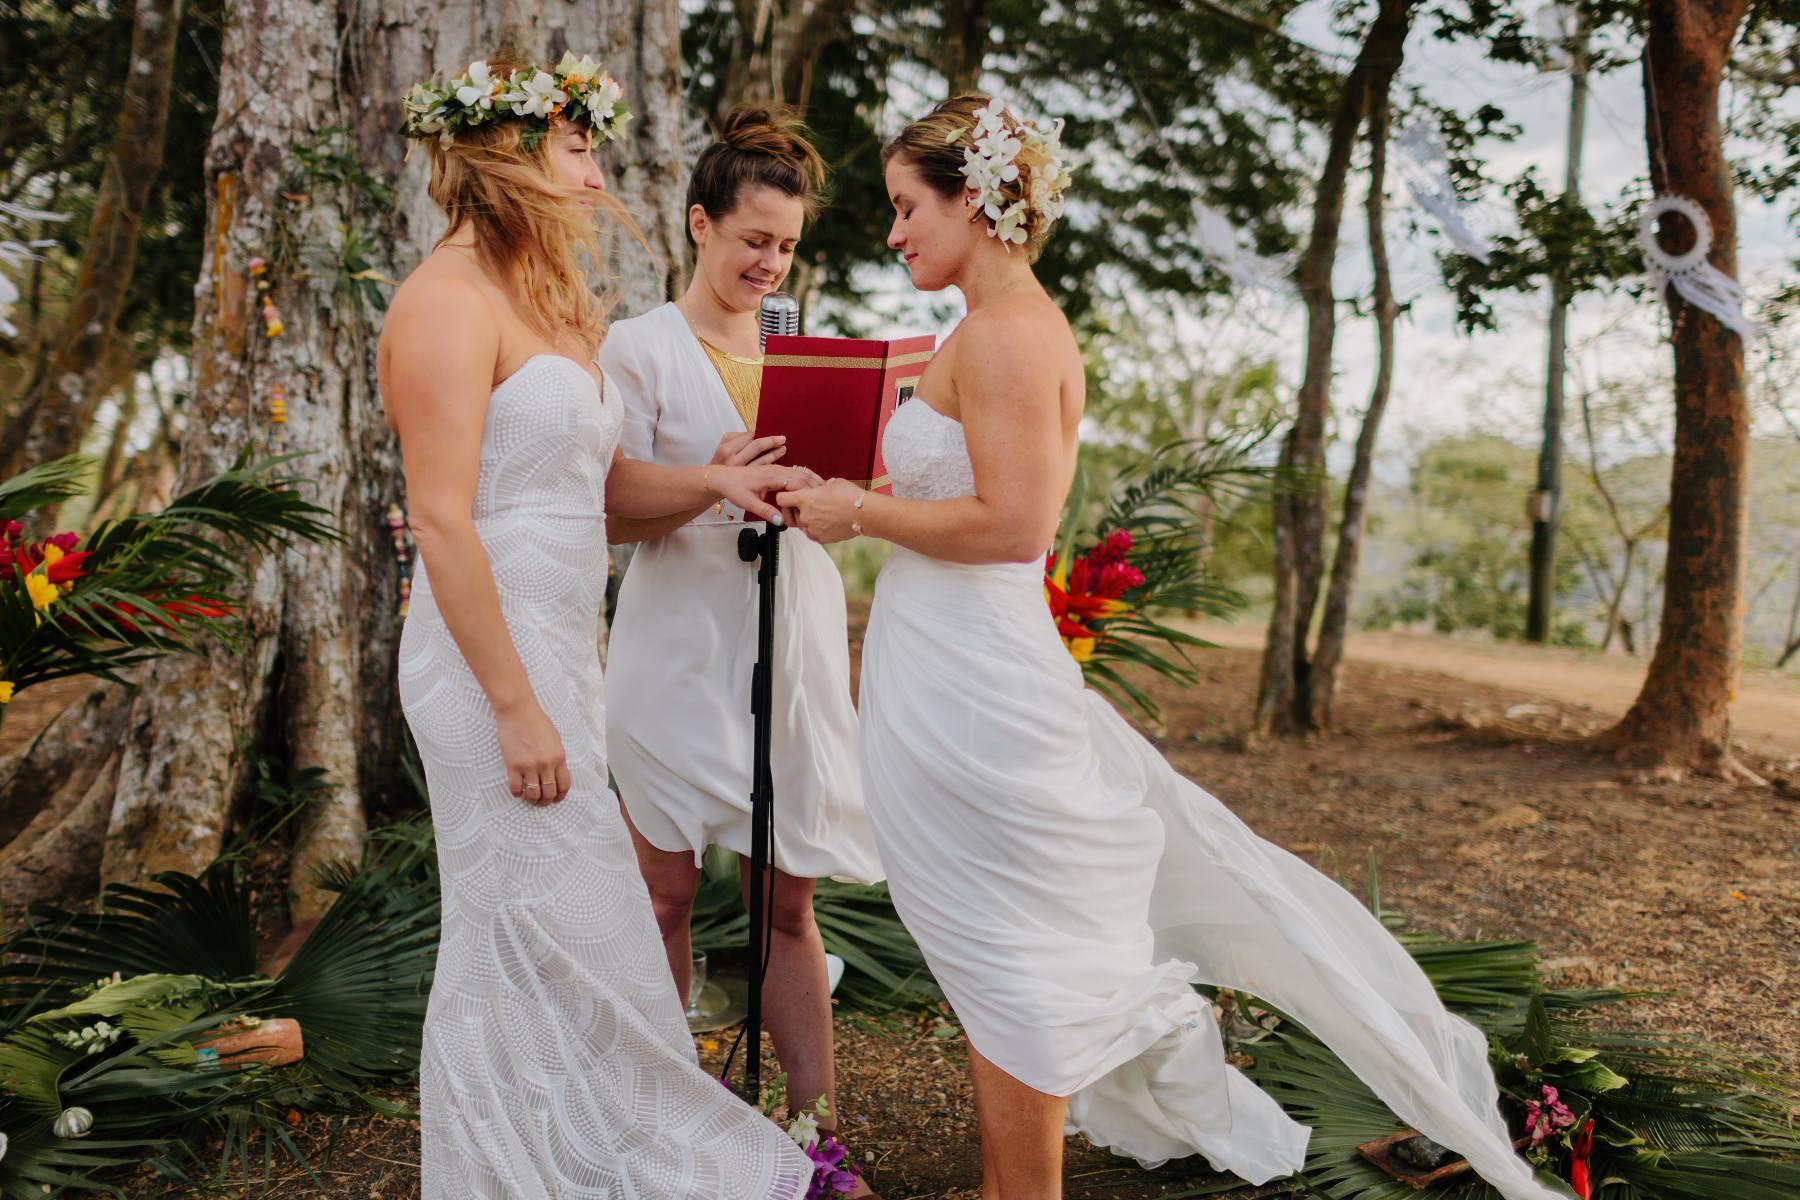 Boho Same-sex wedding under a tree in Costa Rica. Beautiful brides - wedding dress ideas